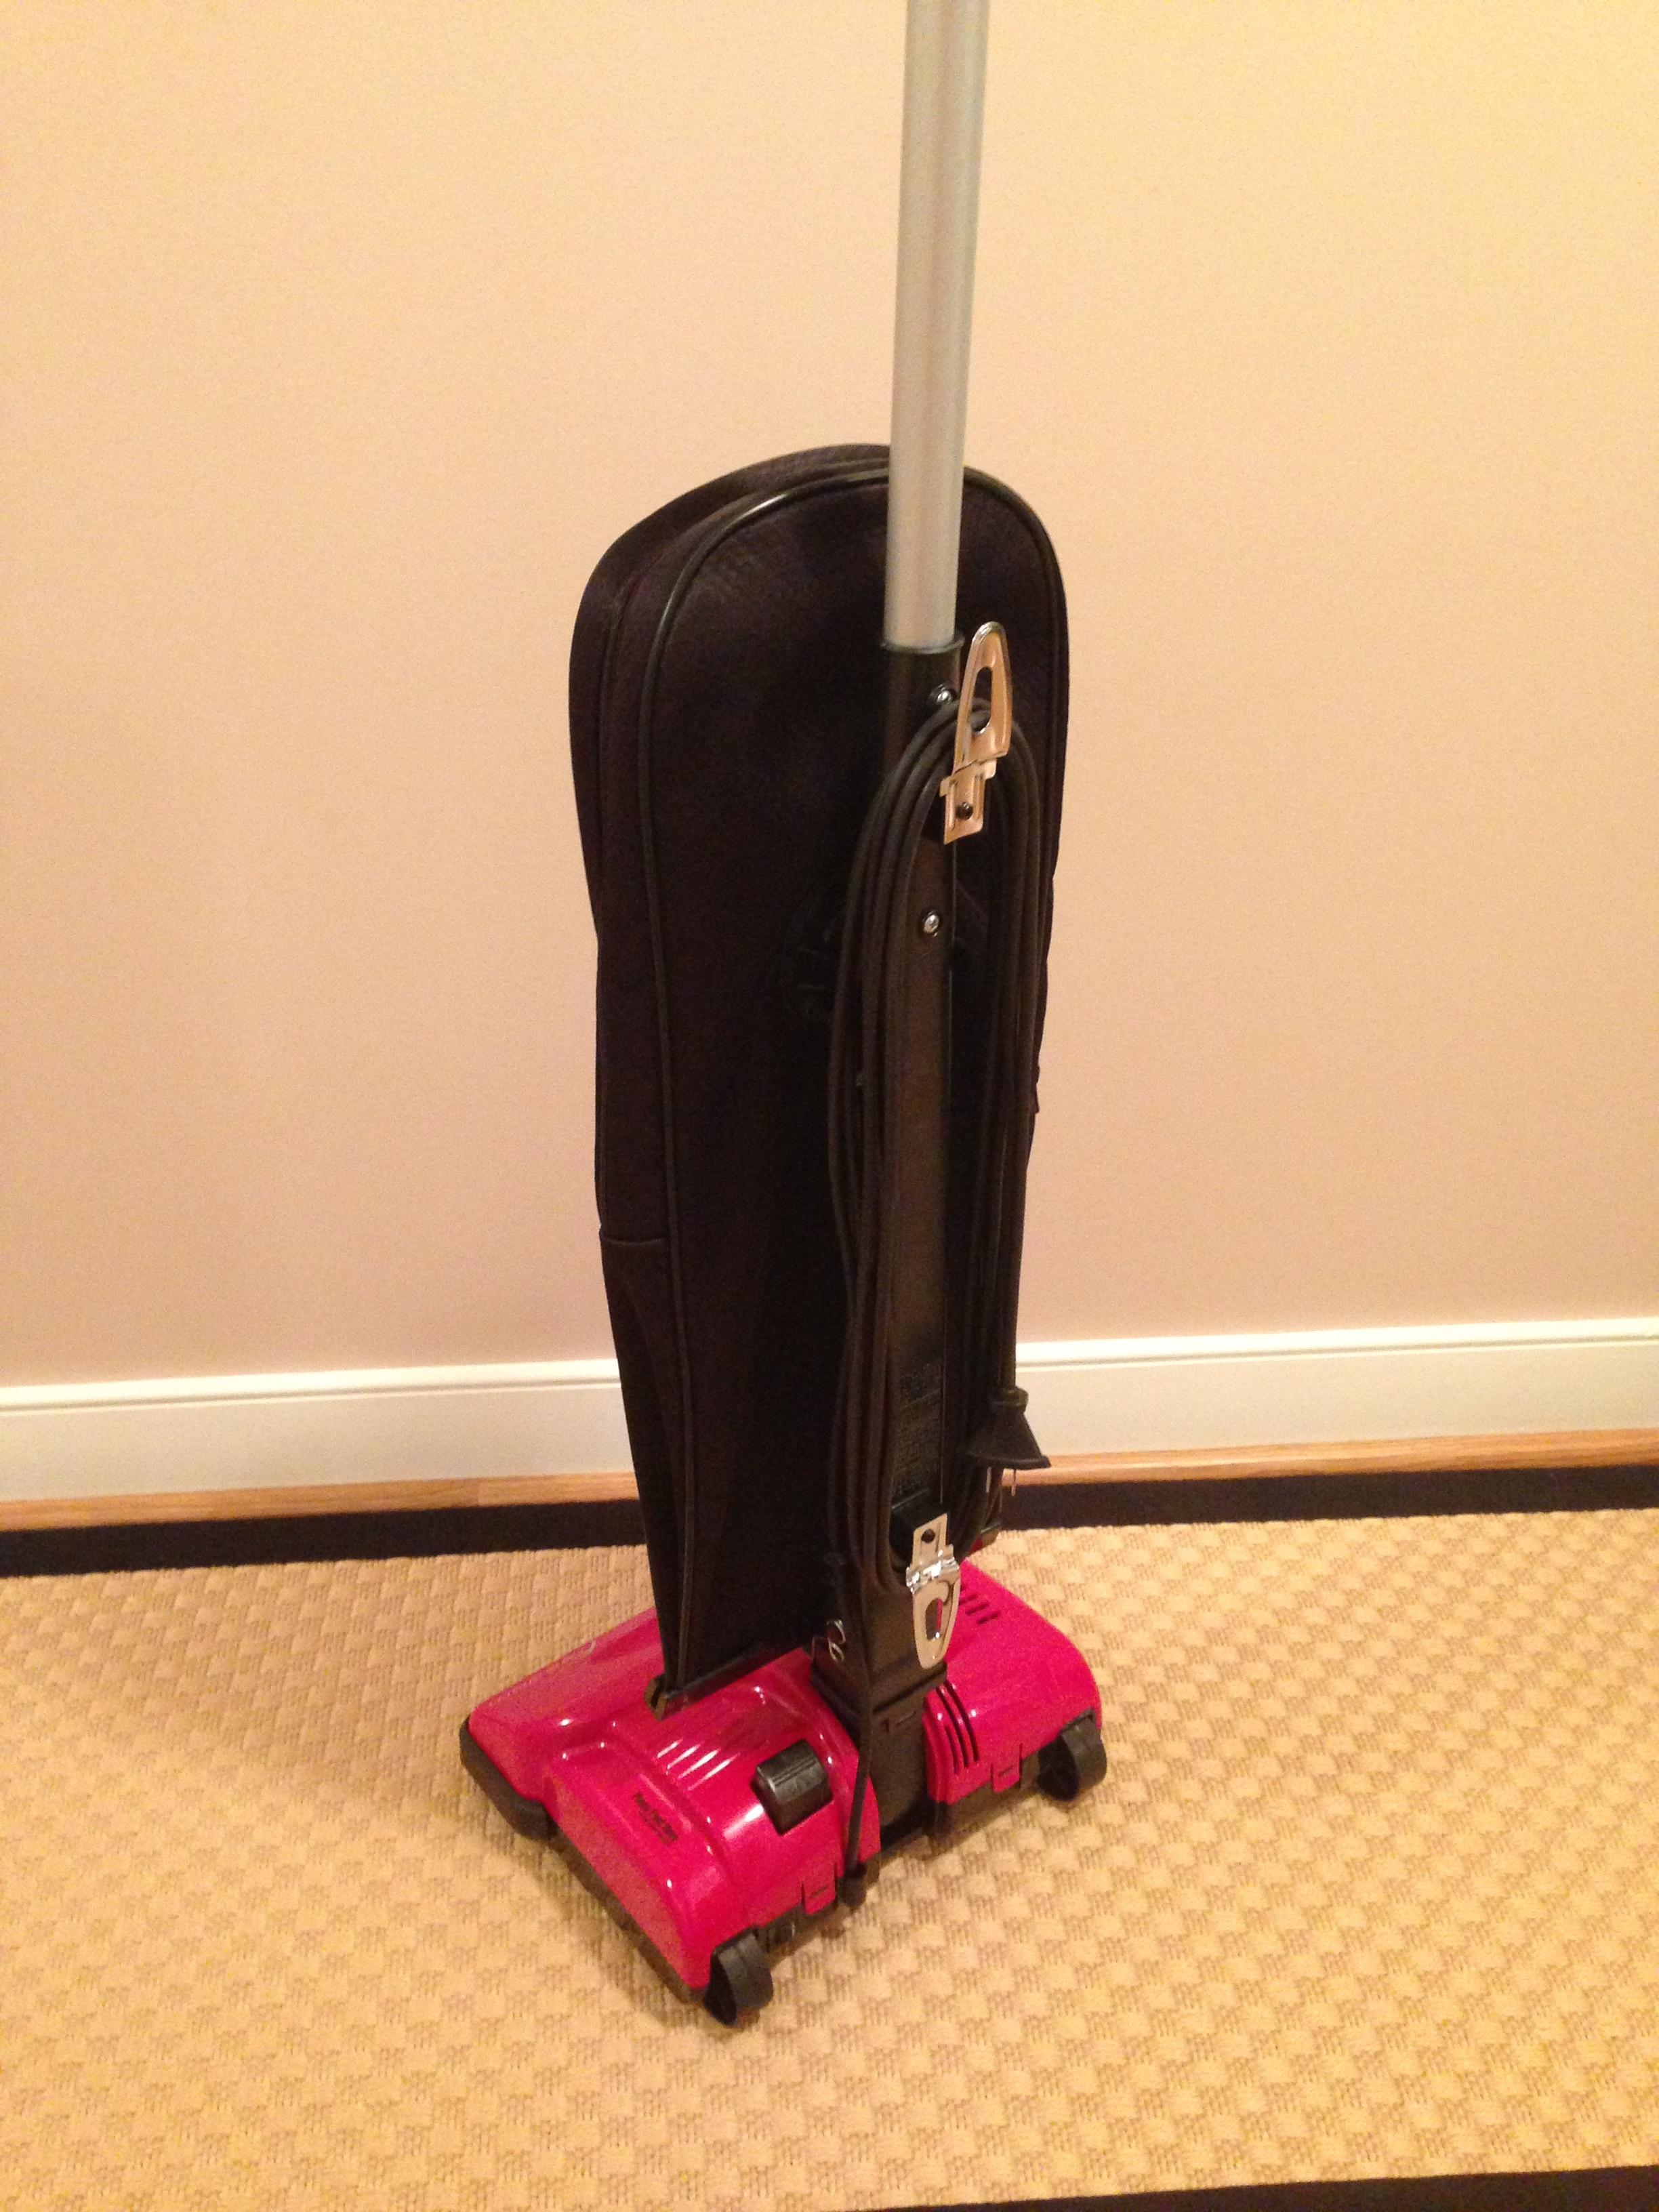 Meet The Simplicity S10E Vacuum Cleaner